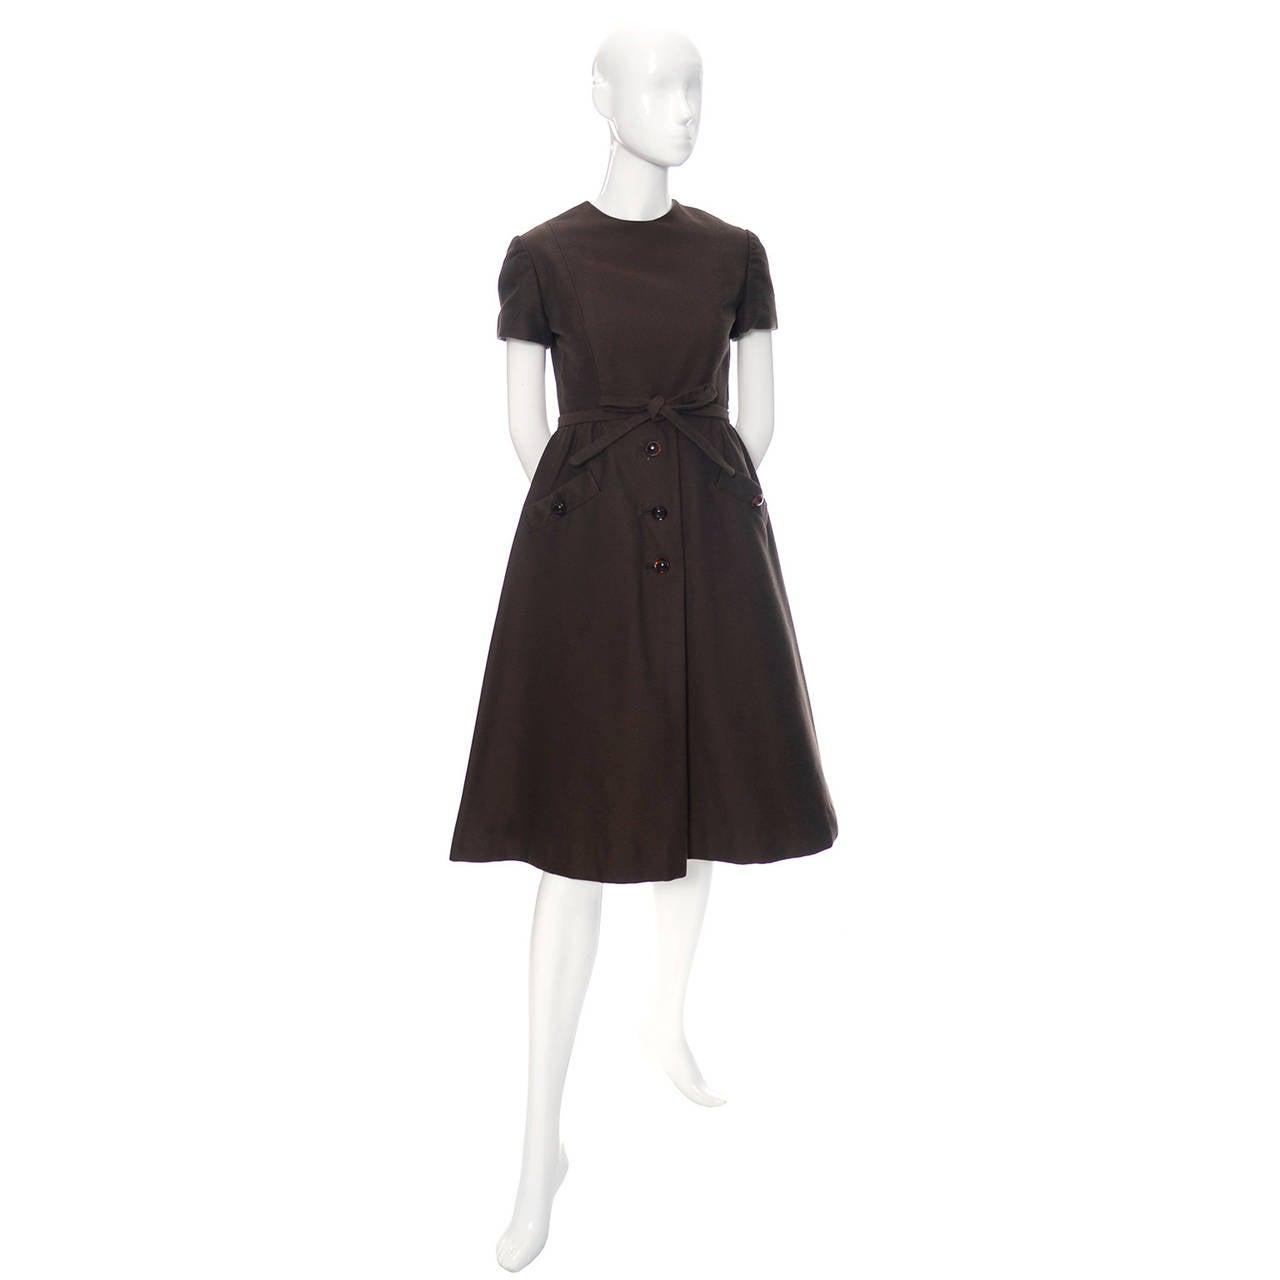 Chocolate Brown Geoffrey Beene 1960s Mod Vintage Dress Pockets Belt For Sale 1